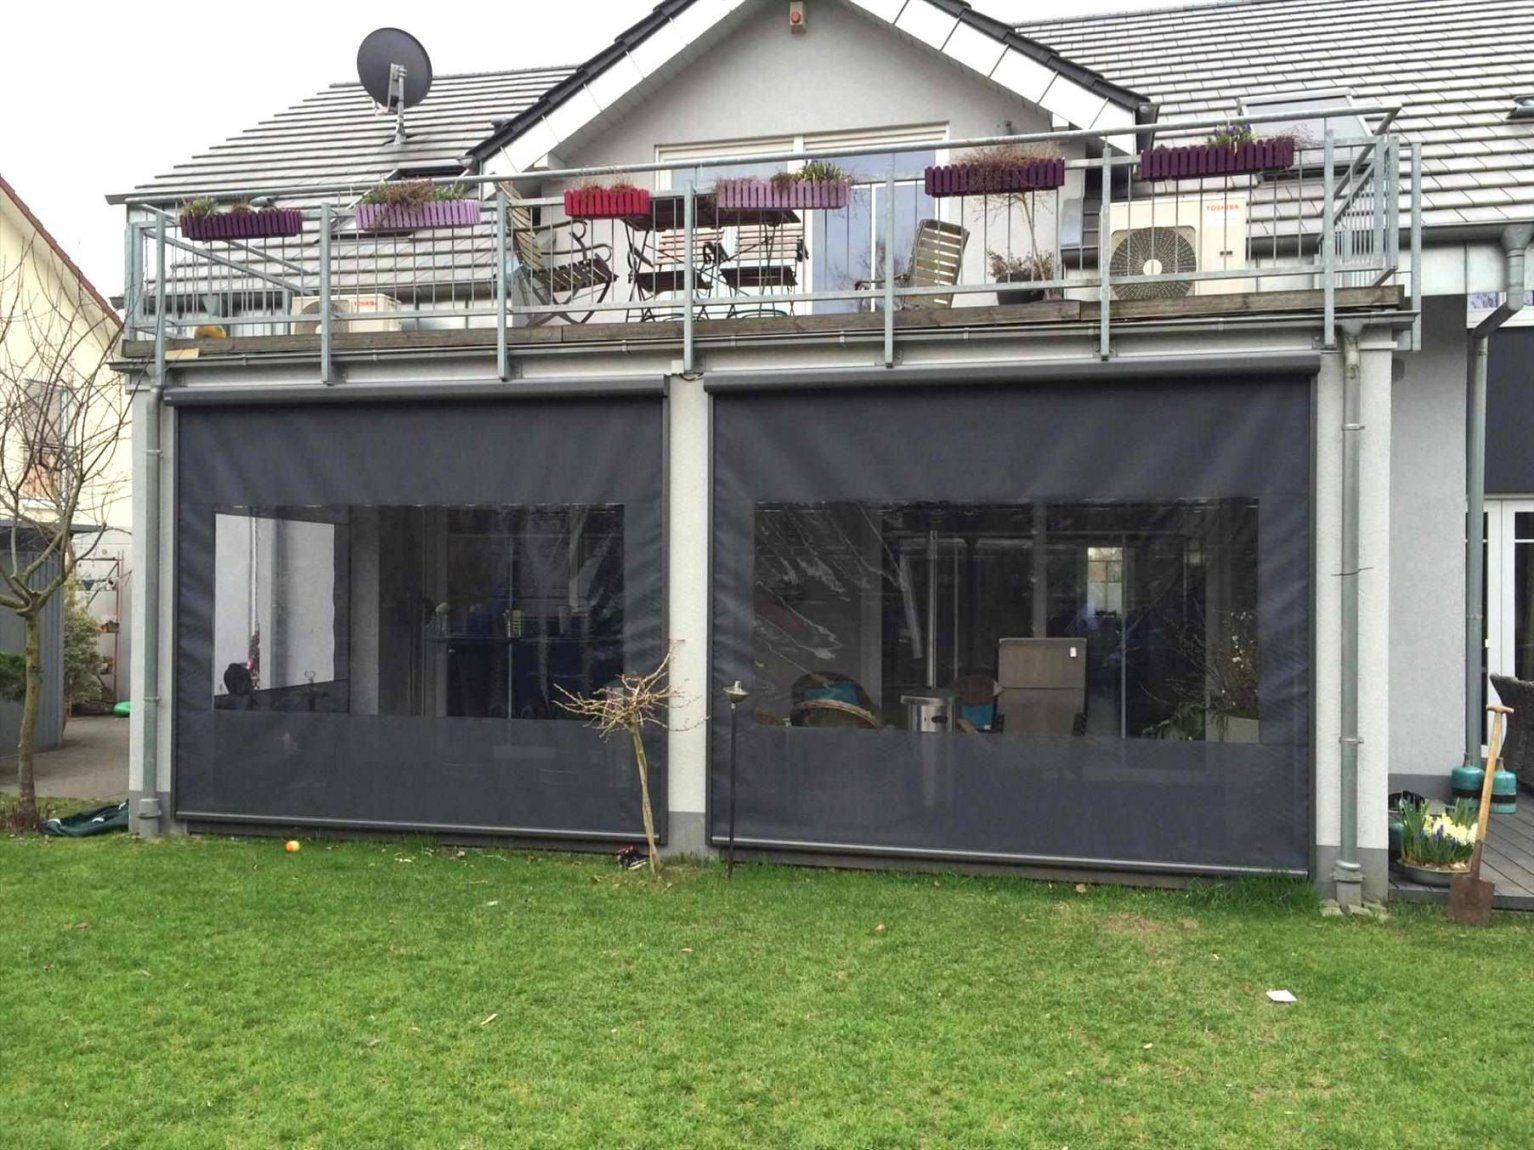 64 Inspirational Regenschutz Terrasse Selber Bauen  Wccp von Balkon Regenschutz Selber Bauen Photo